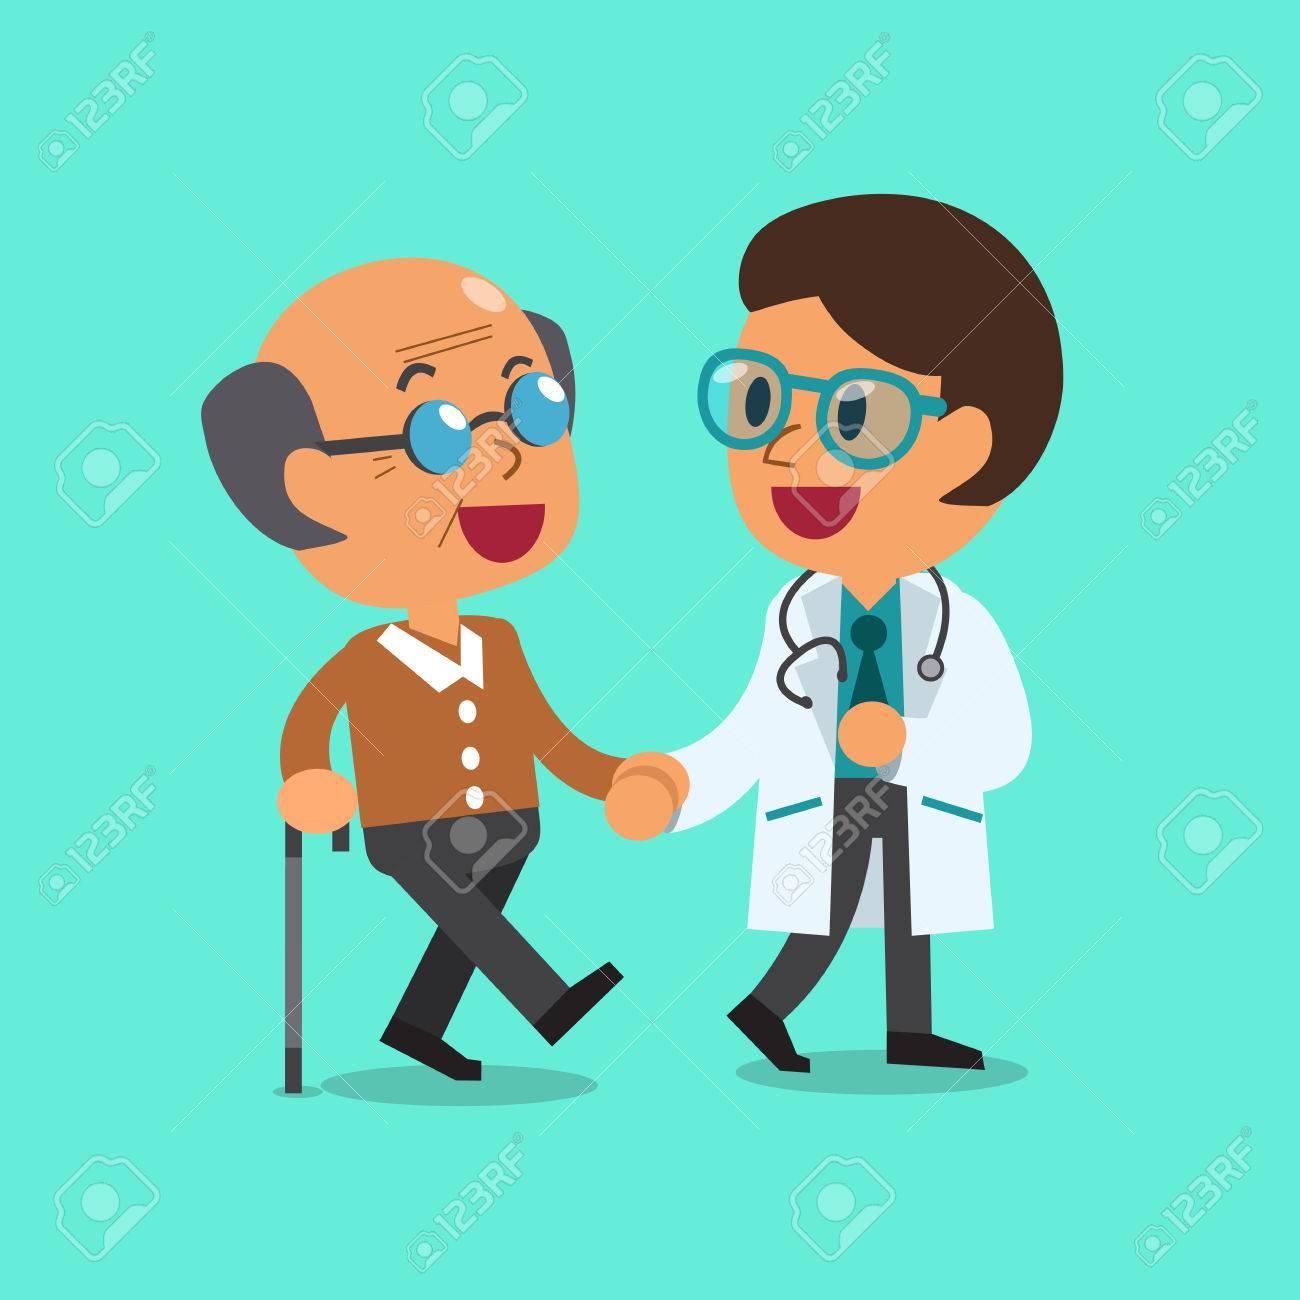 Cartoon doctor helping old man to walk - 53668567